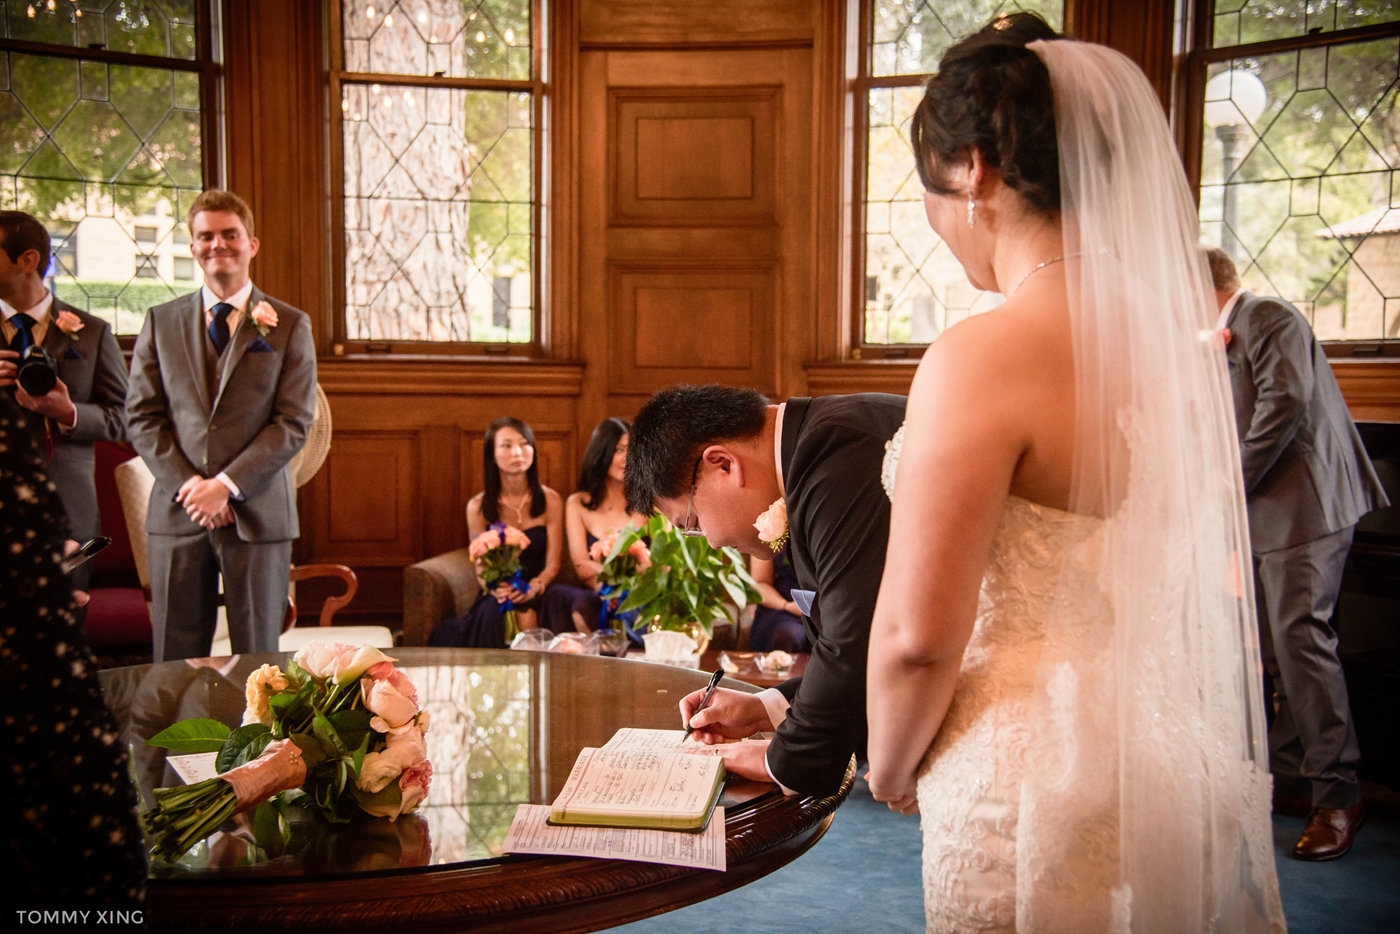 STANFORD MEMORIAL CHURCH WEDDING - Wenjie & Chengcheng - SAN FRANCISCO BAY AREA 斯坦福教堂婚礼跟拍 - 洛杉矶婚礼婚纱照摄影师 Tommy Xing Photography132.jpg